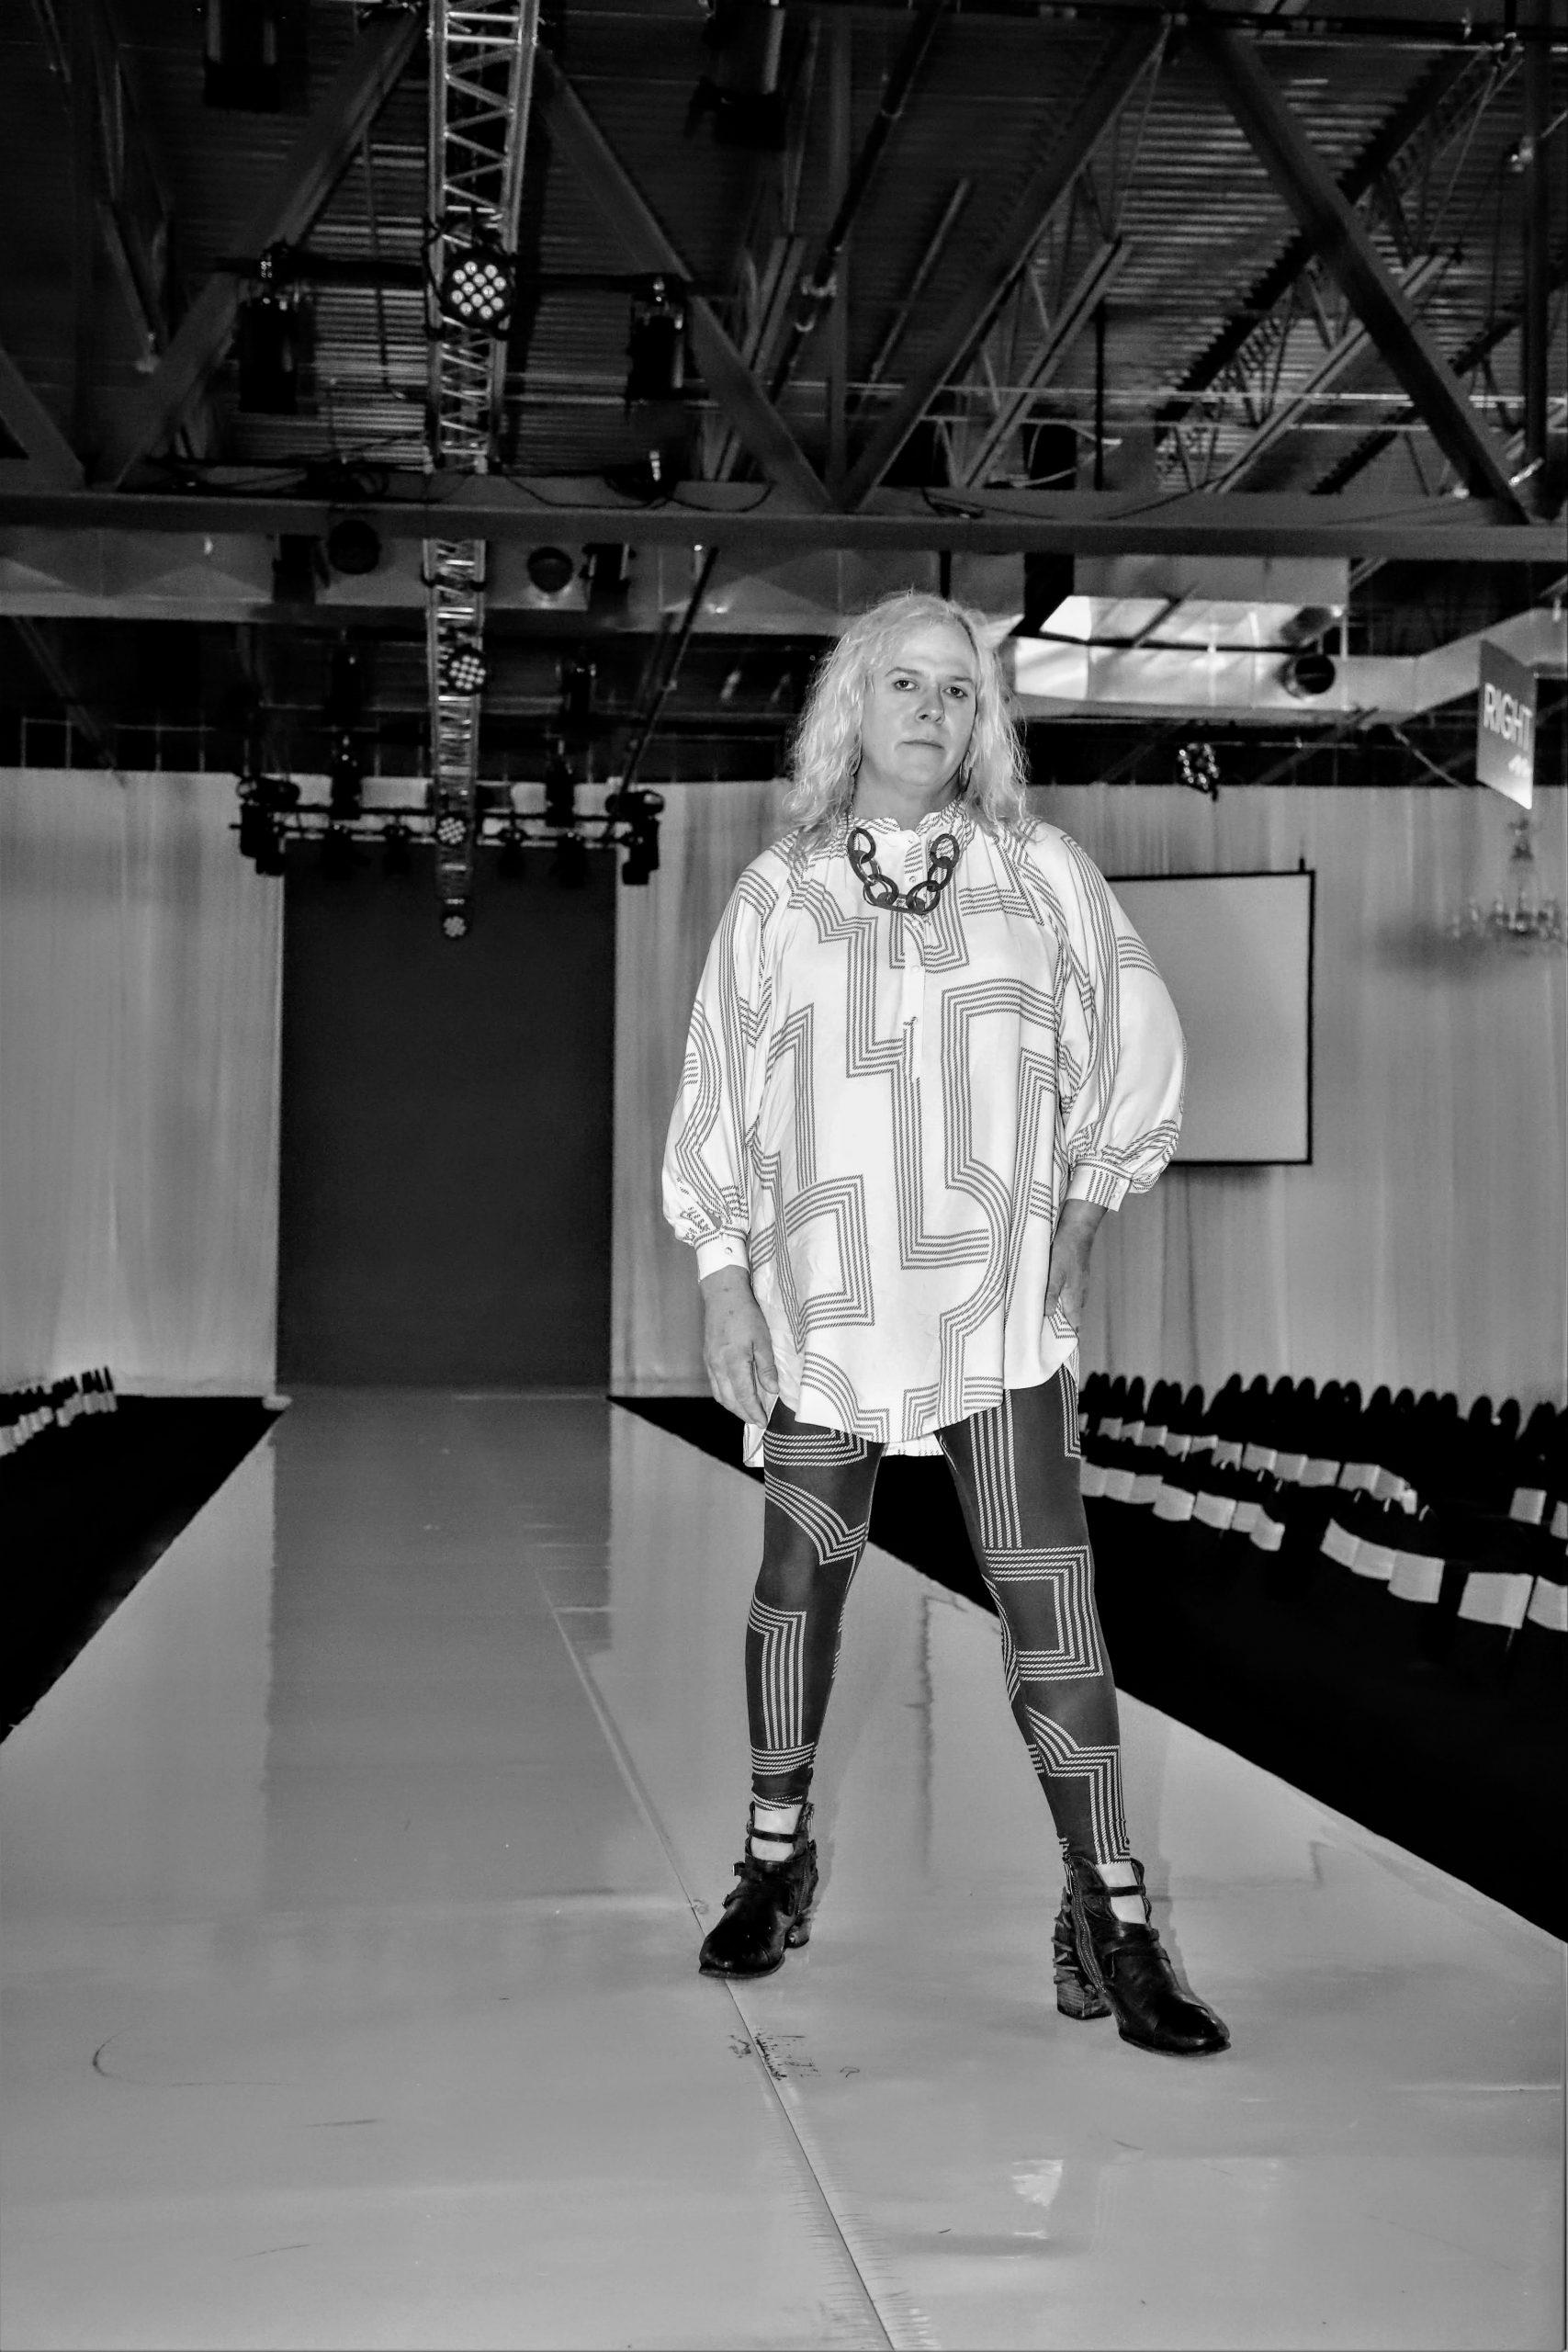 Jerra Kaitlynn Whittaker Prepares for New York Fashion Week Comeback, Embraces Acceptance to Global Female Community 1